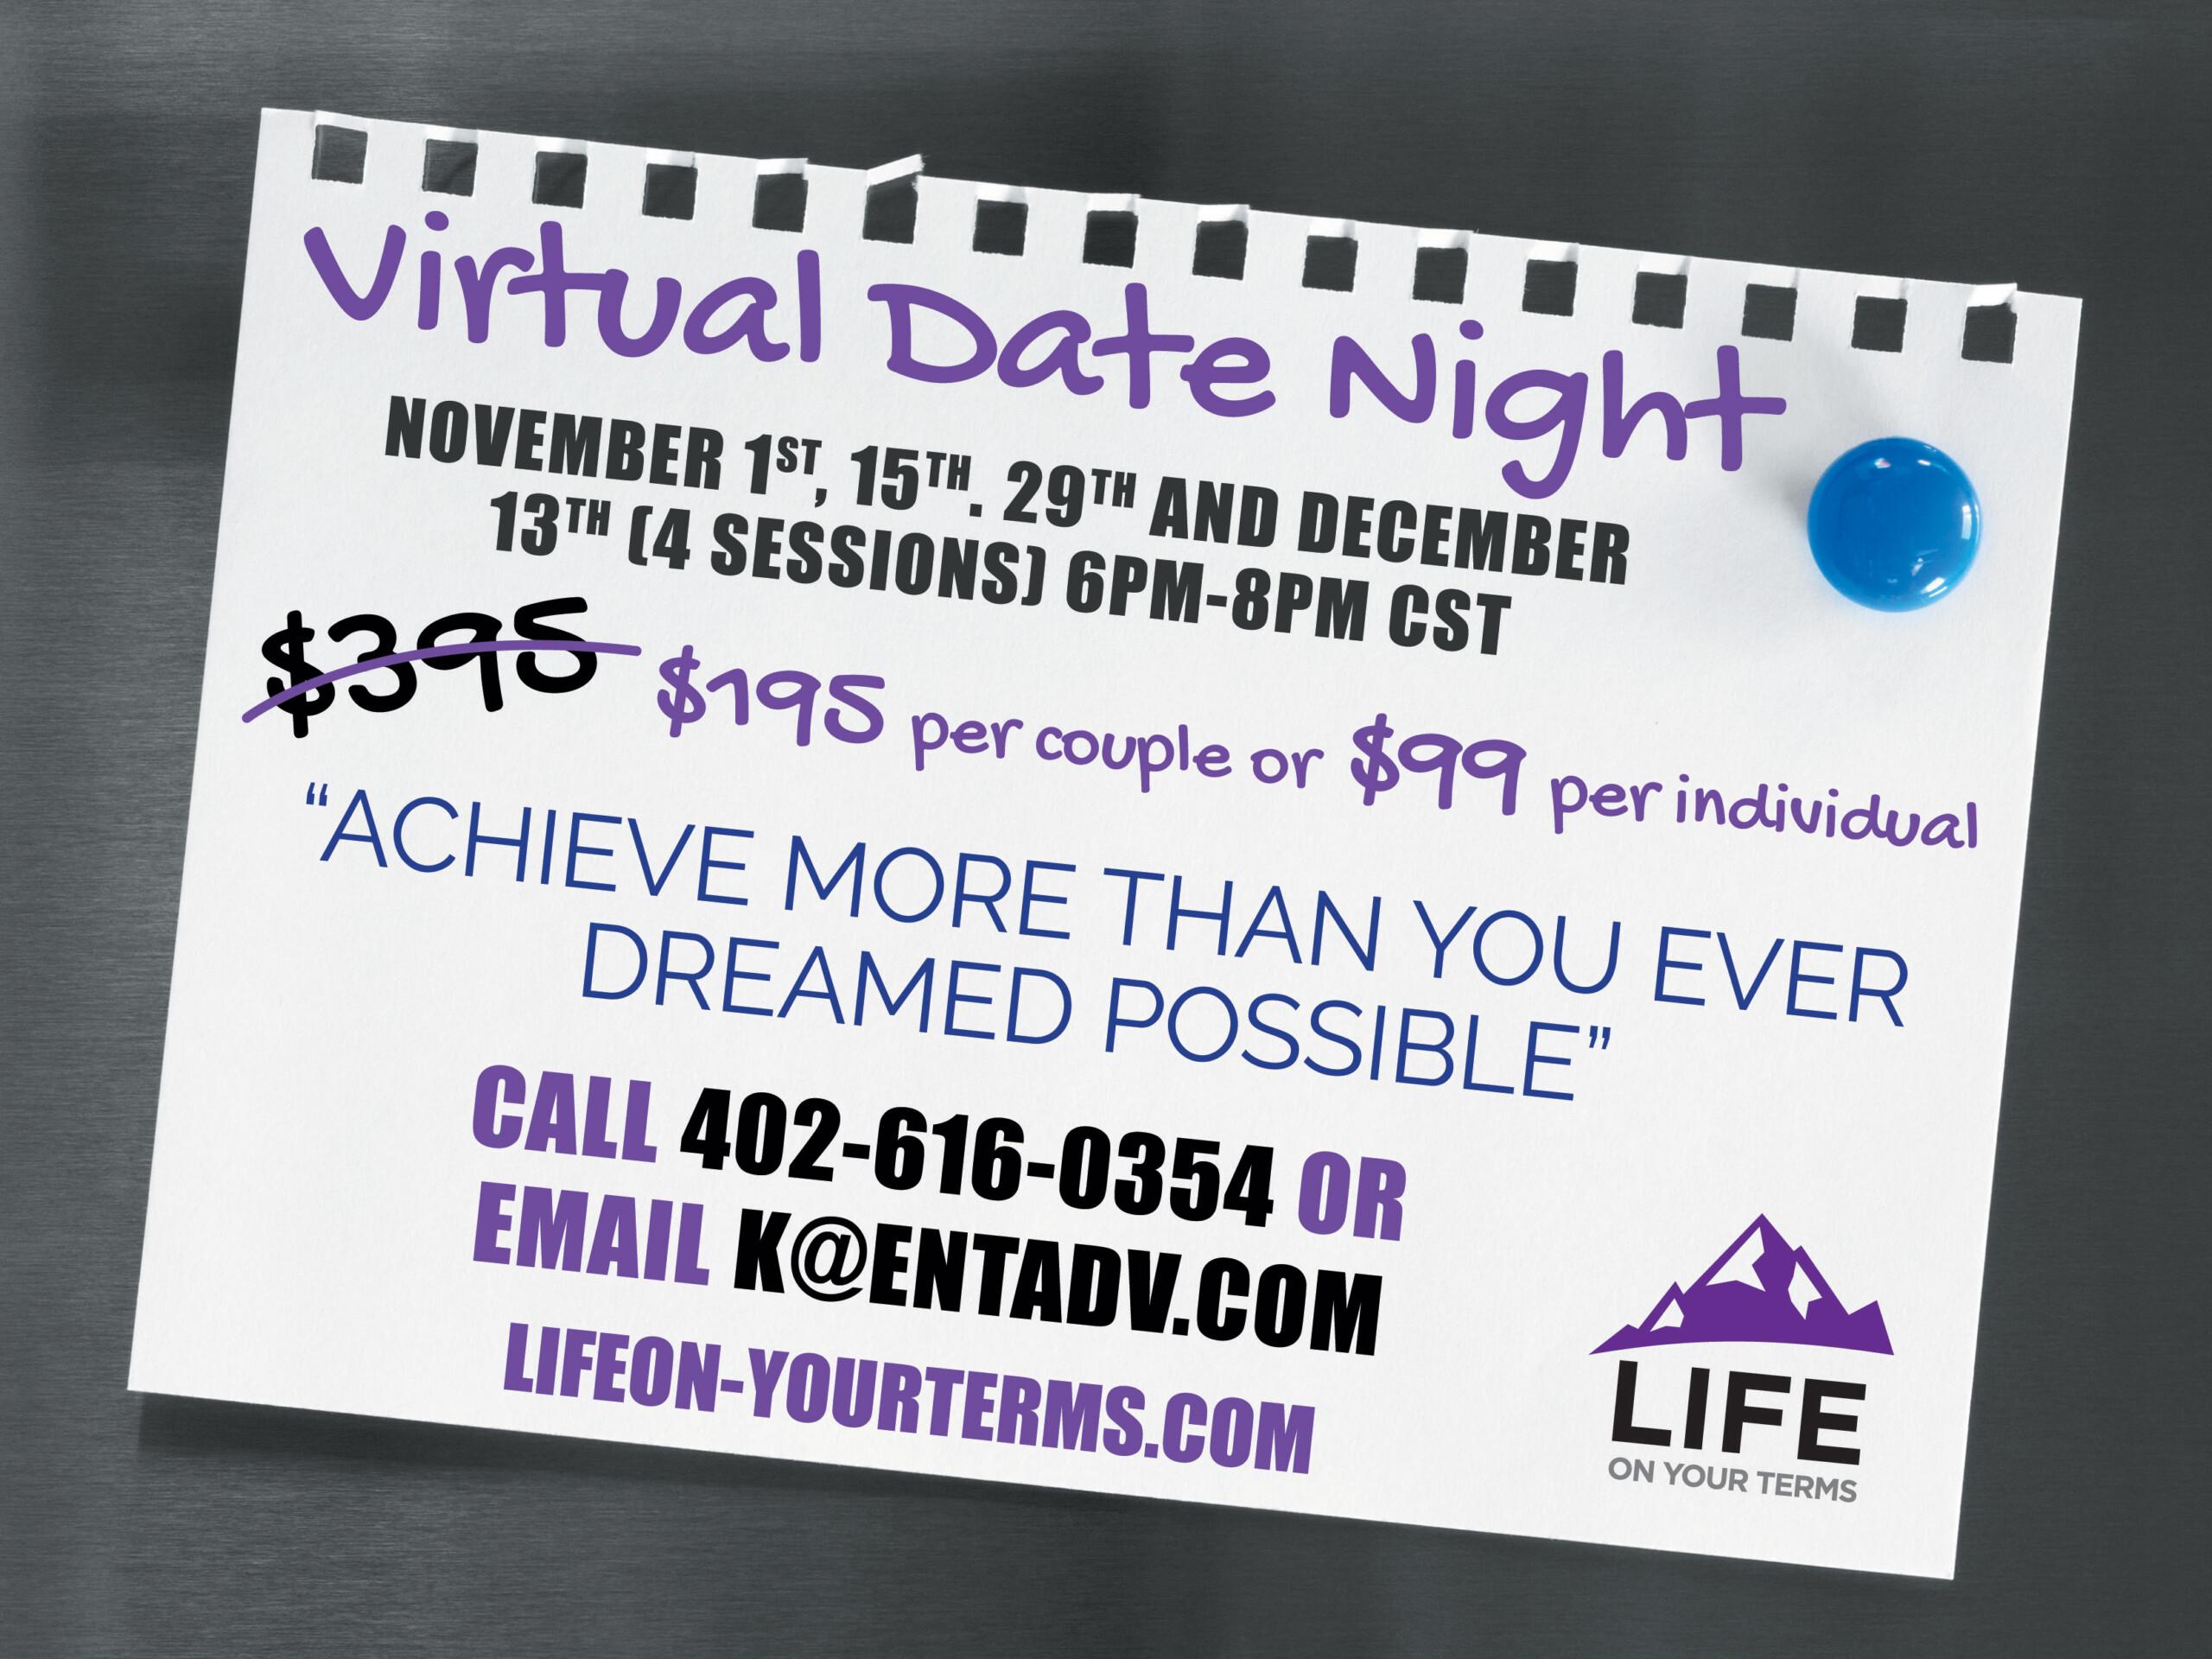 Date-Night-Social-Advert-Nov-1st-WEB